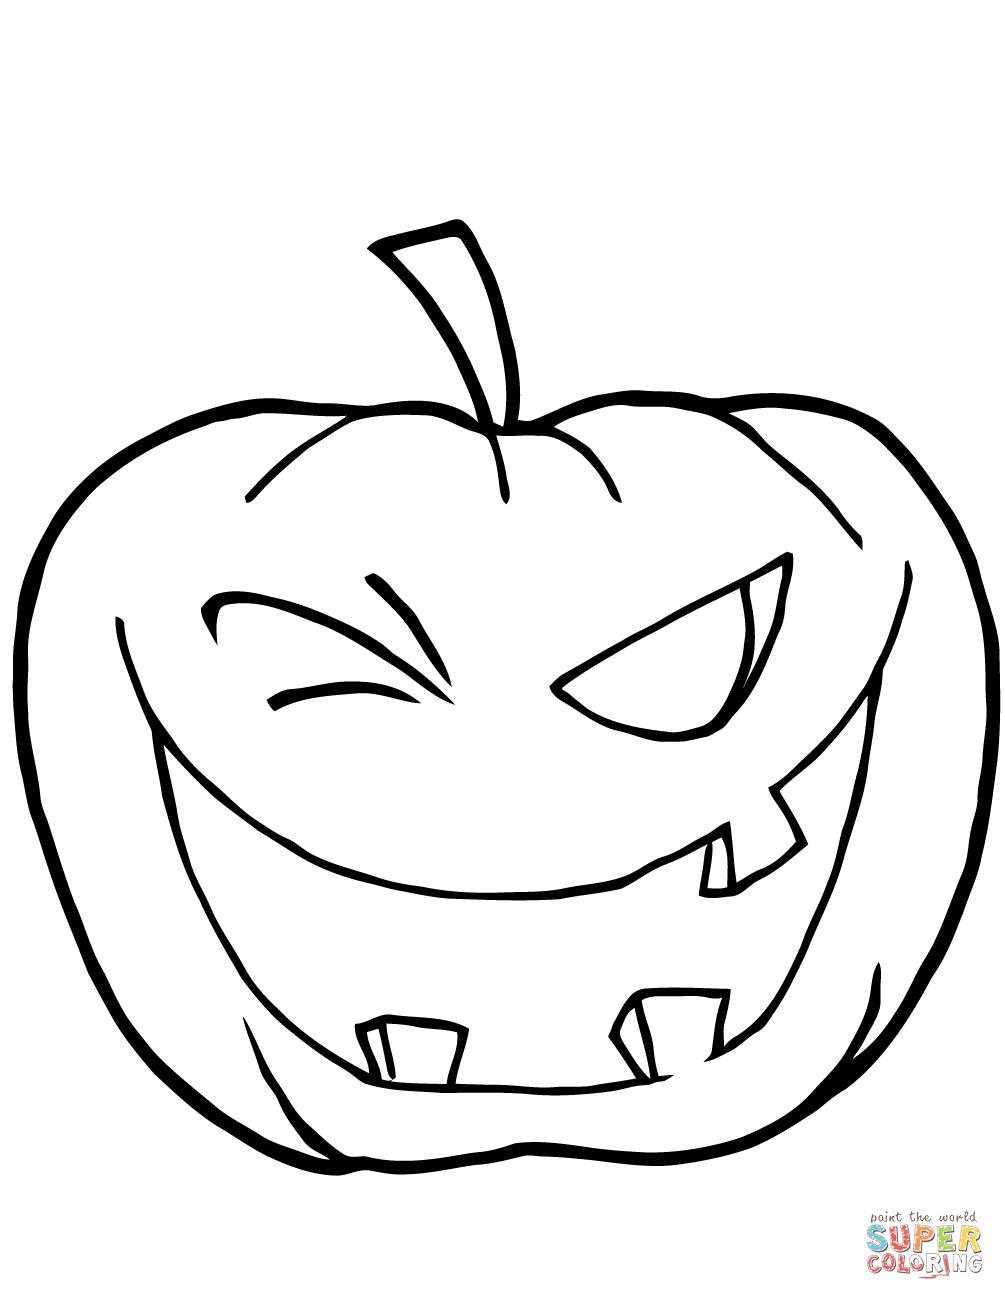 1005x1300 Pumpkins Coloring Pages Free Coloring Pages Pumpkin Color Page